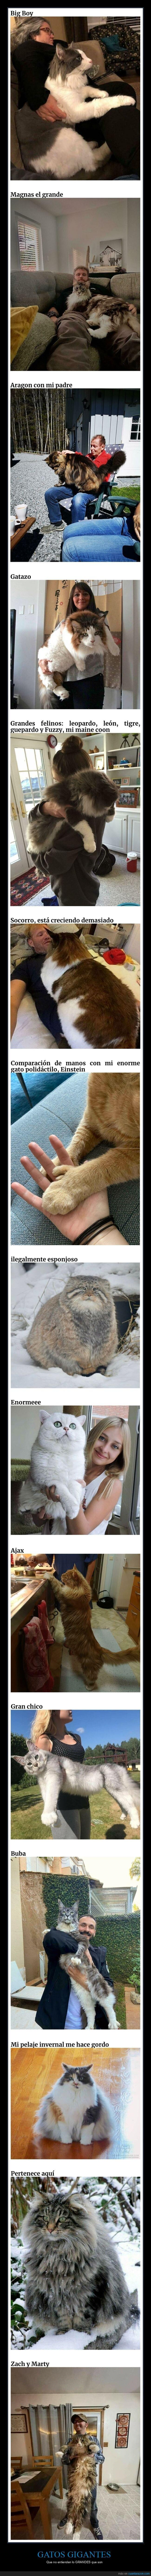 gatos,gigantes,grandes